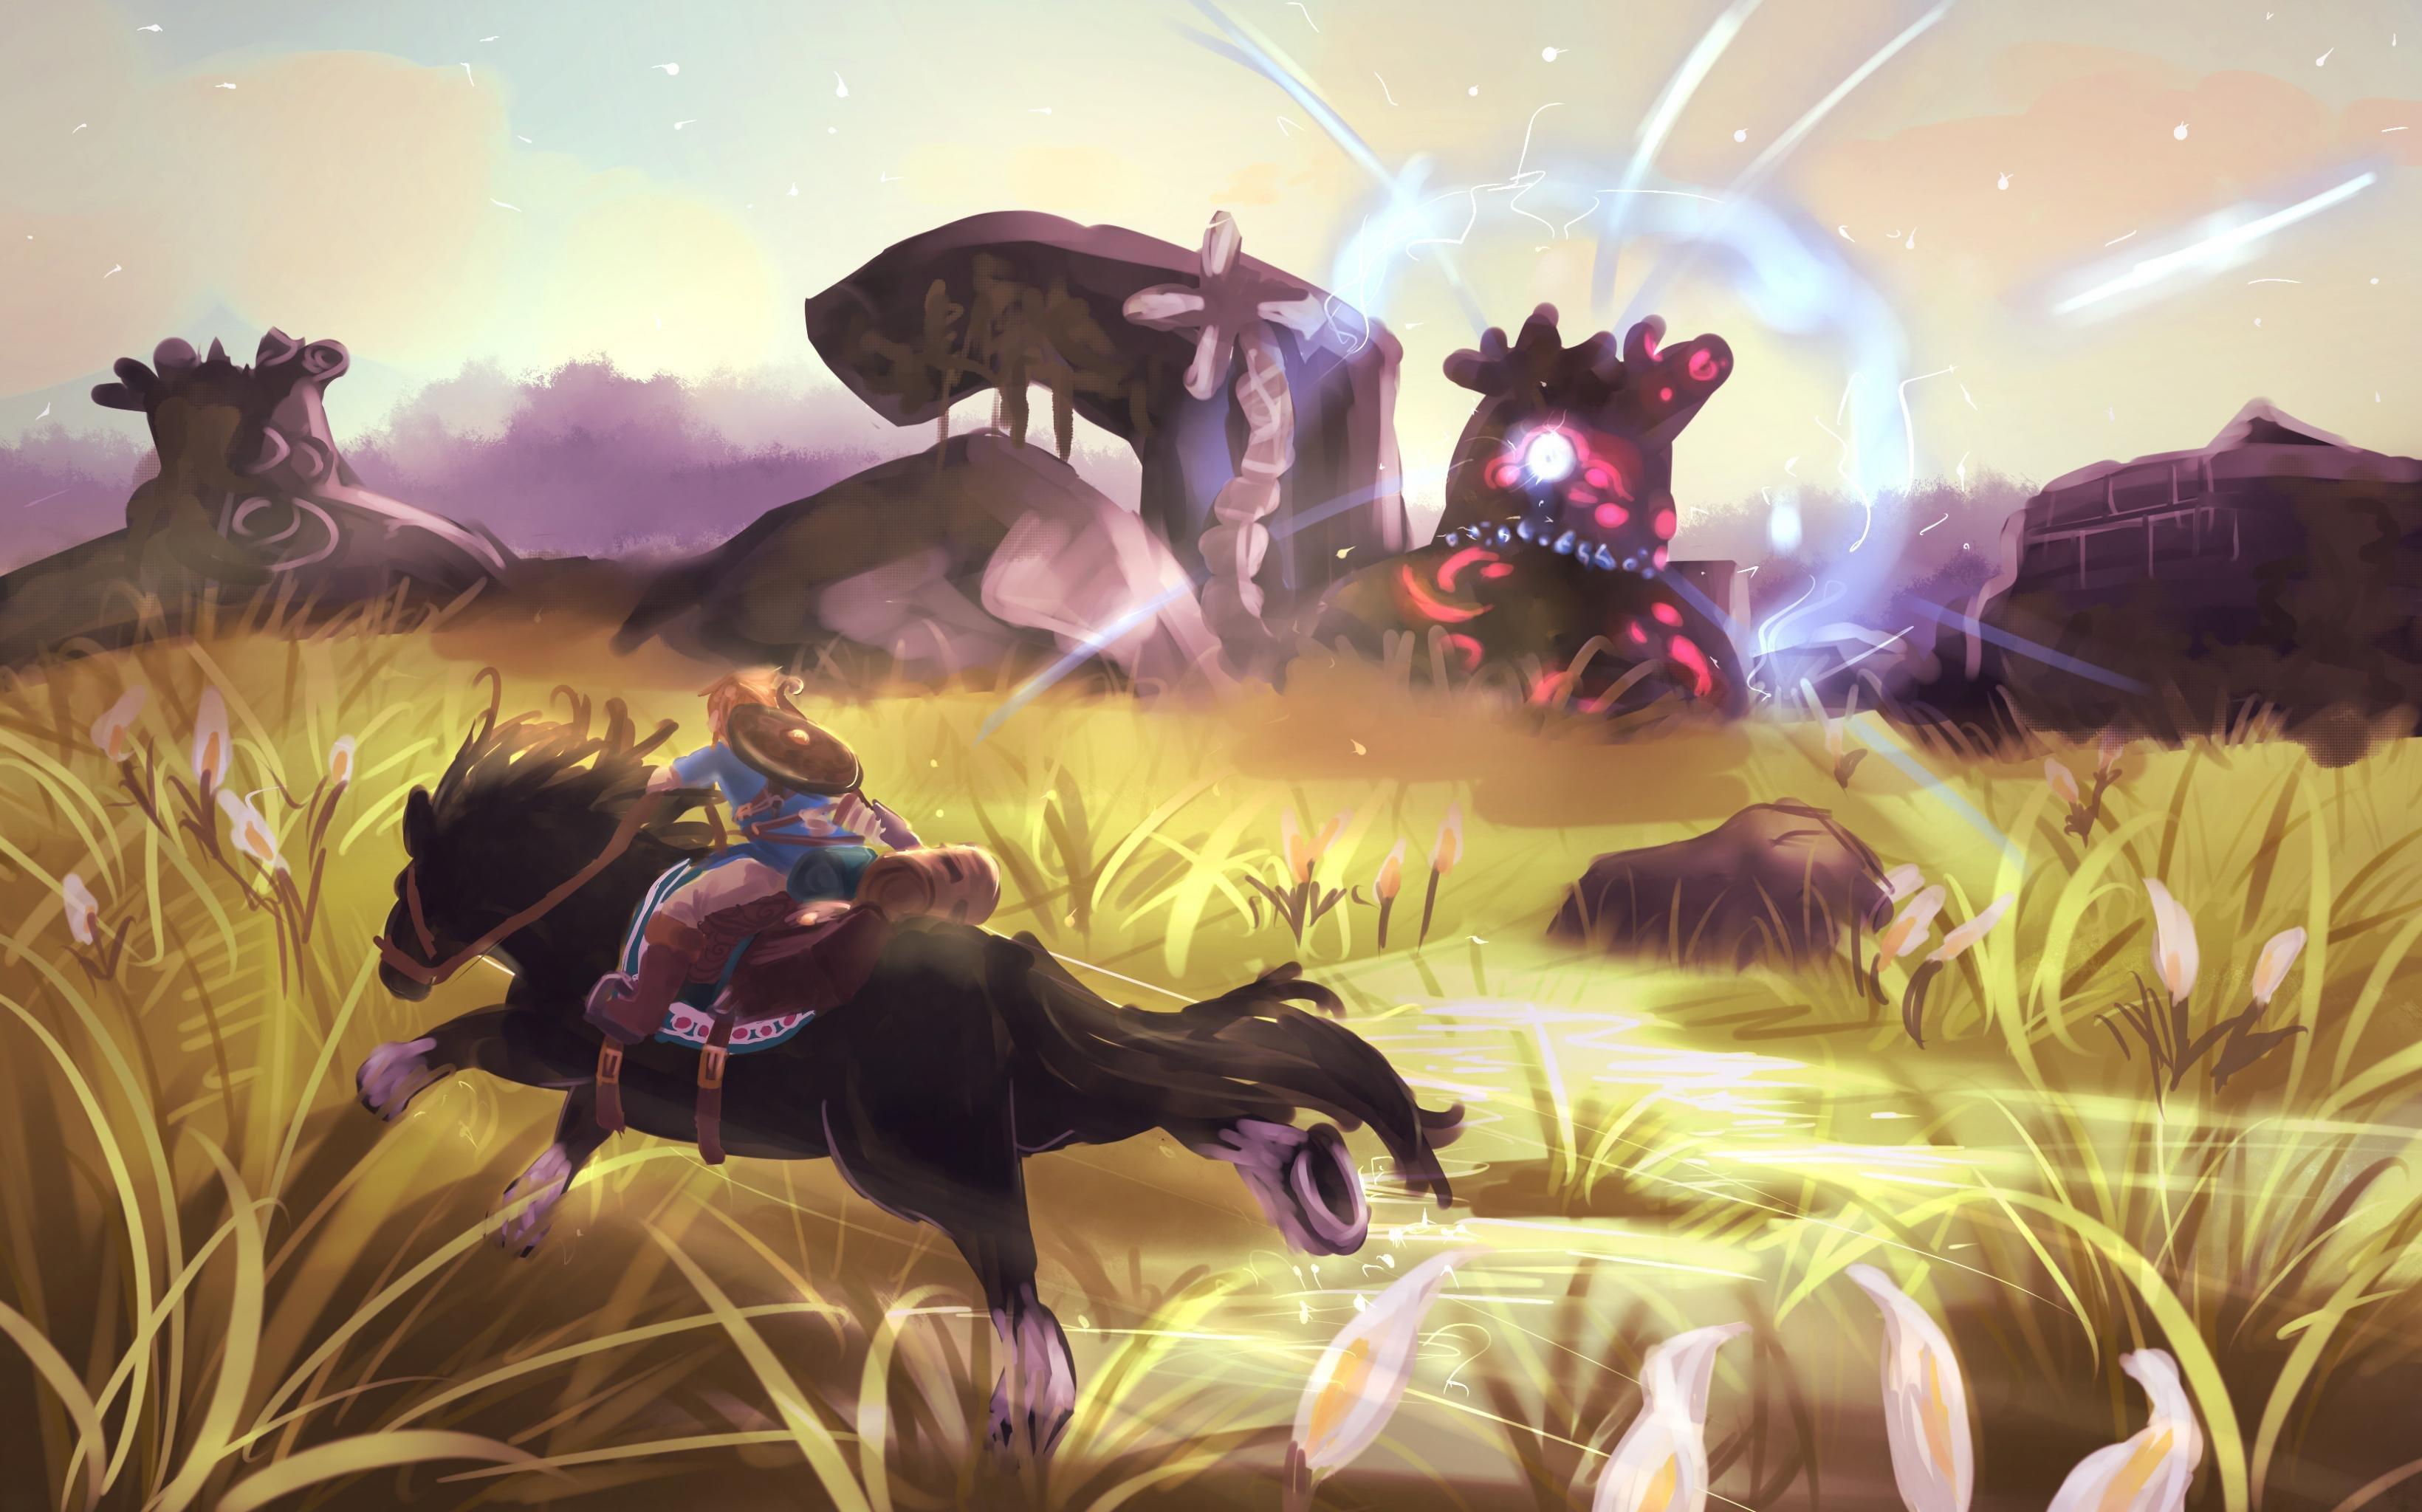 High Resolution The Legend Of Zelda Breath Of The Wild Hd